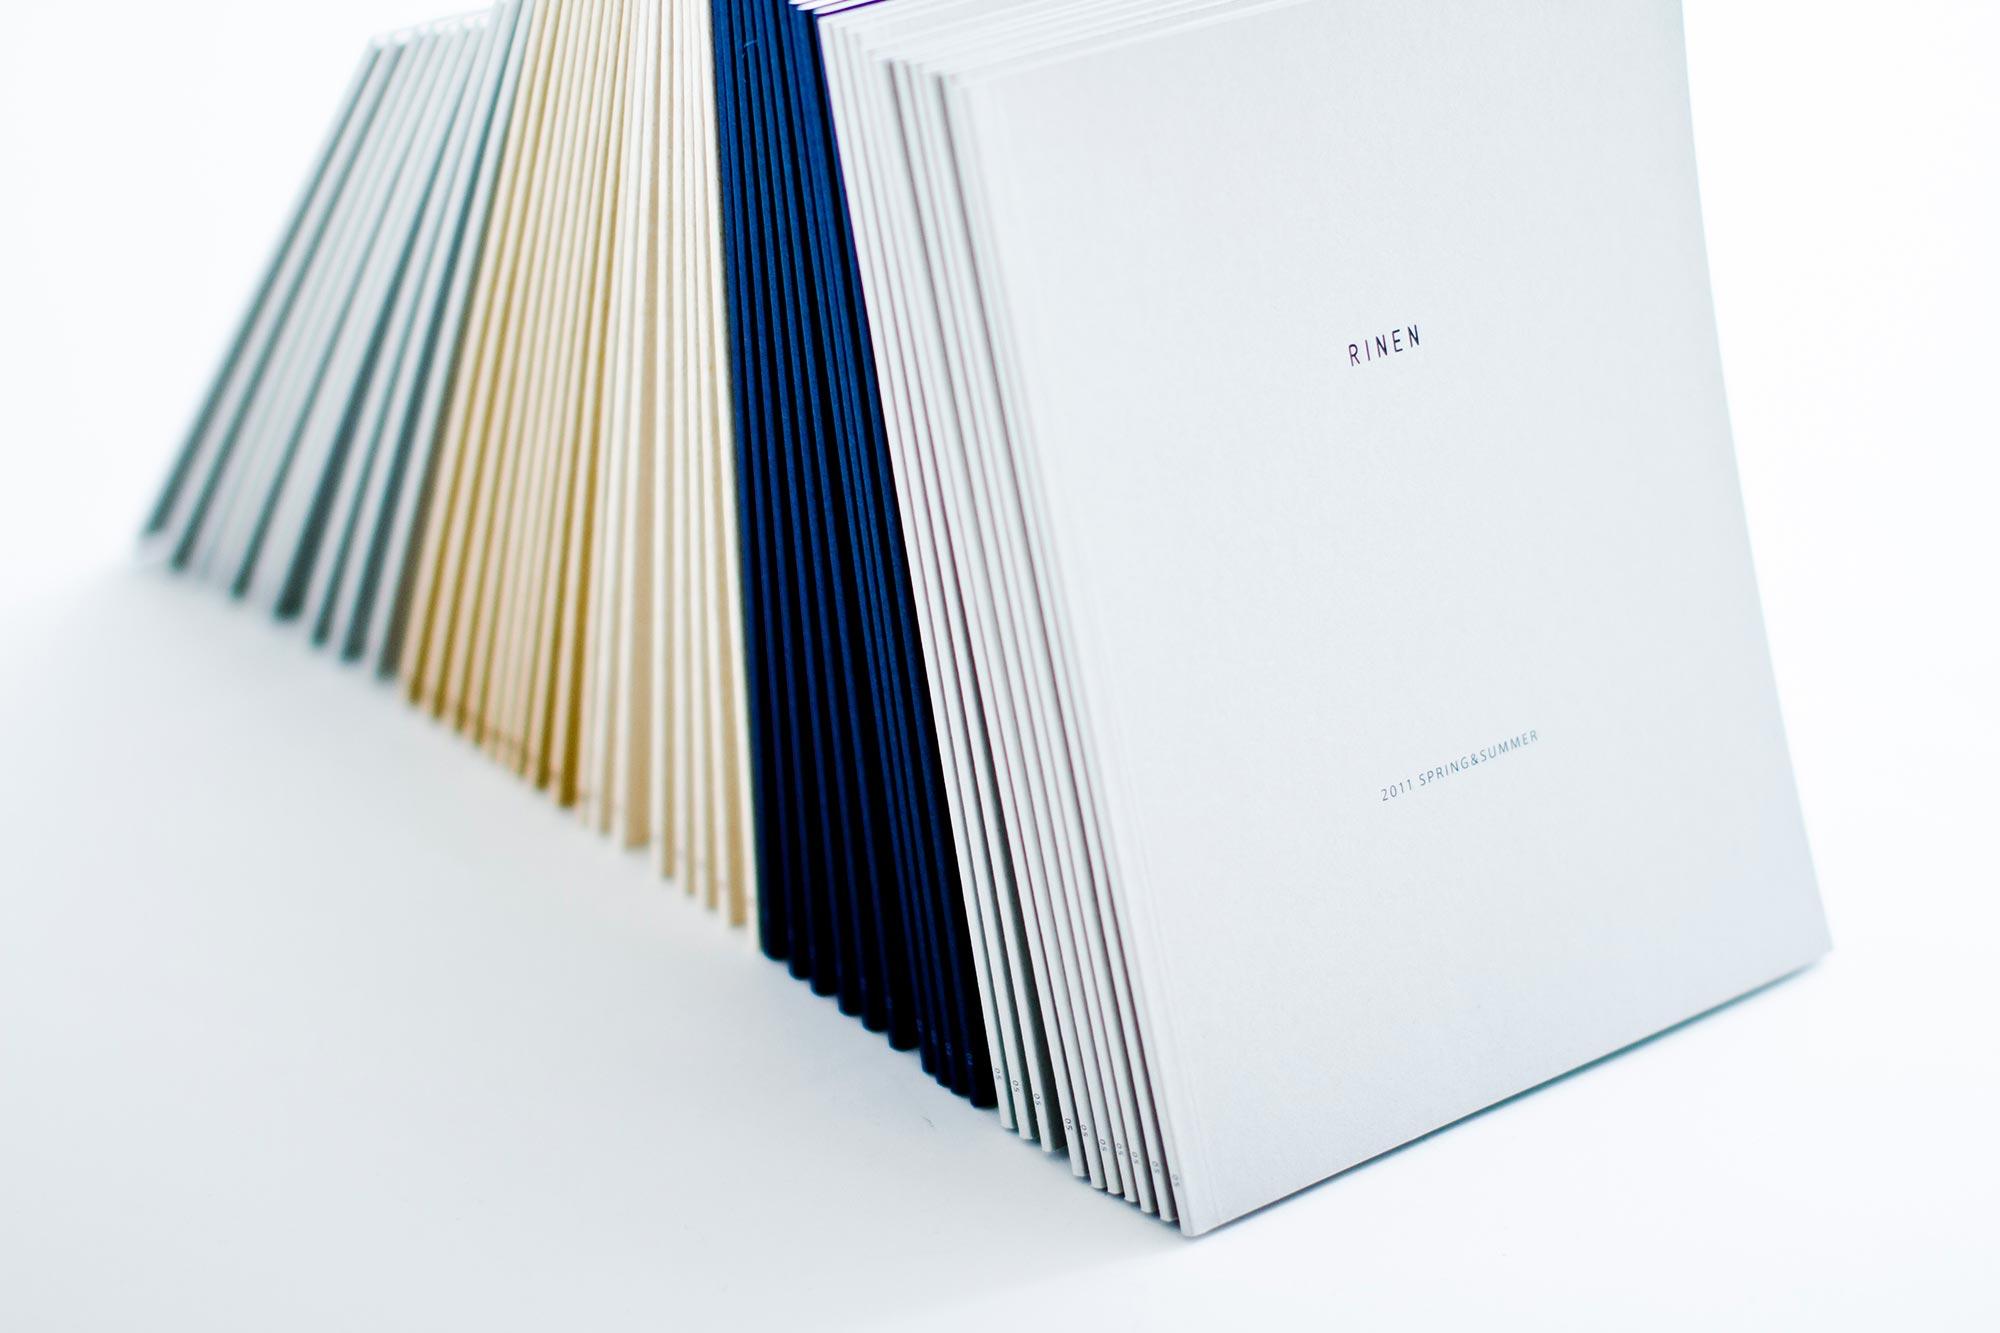 026rinen_catalog